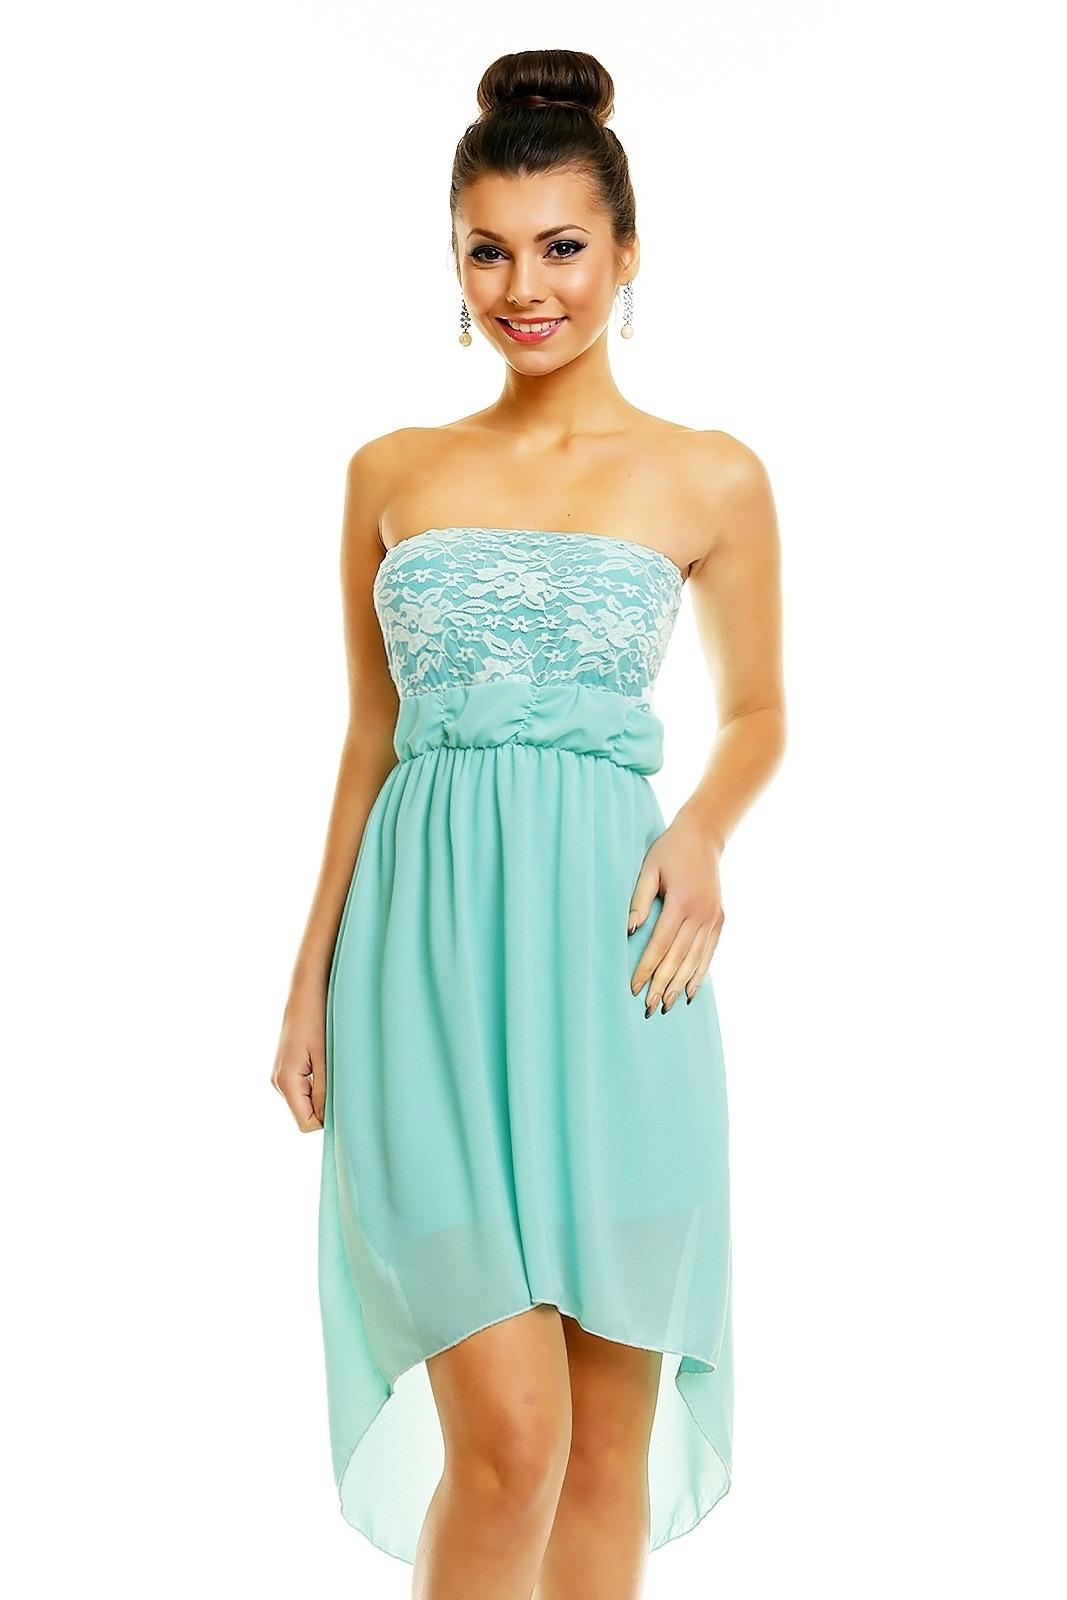 Formal Luxurius Kleid Lachs Galerie13 Perfekt Kleid Lachs Spezialgebiet